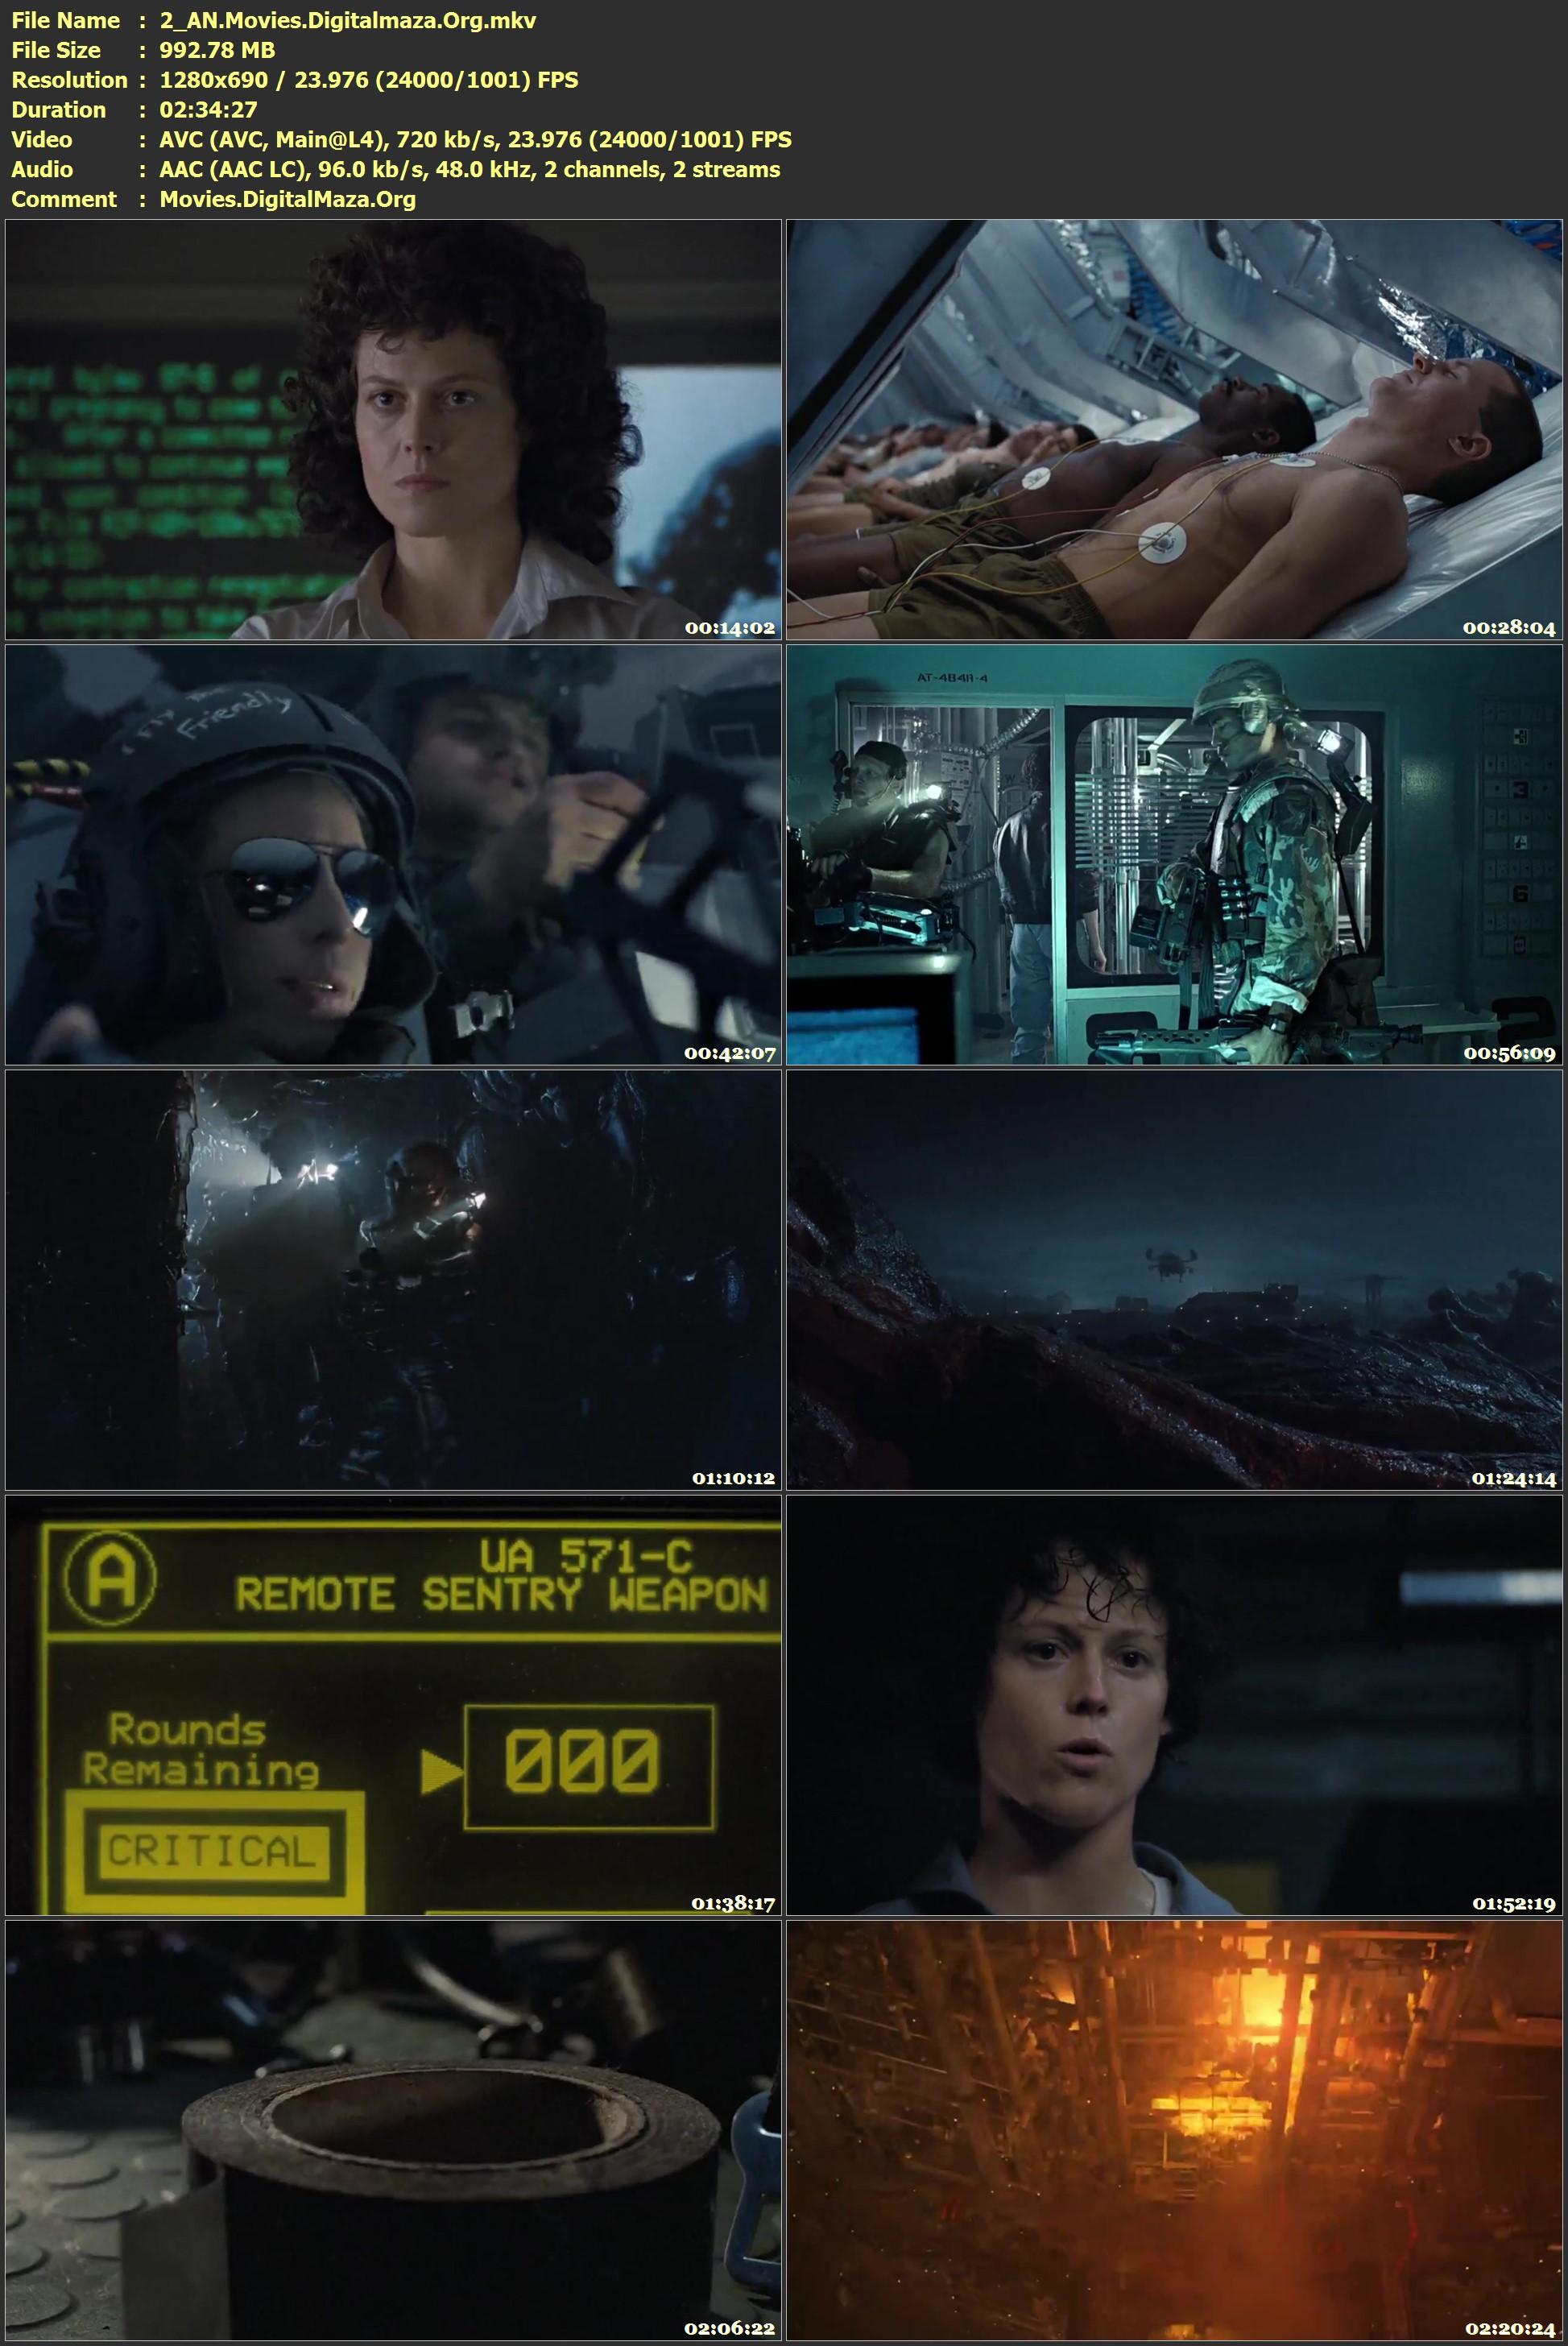 https://image.ibb.co/gYjnhc/2_AN_Movies_Digitalmaza_Org_mkv.jpg